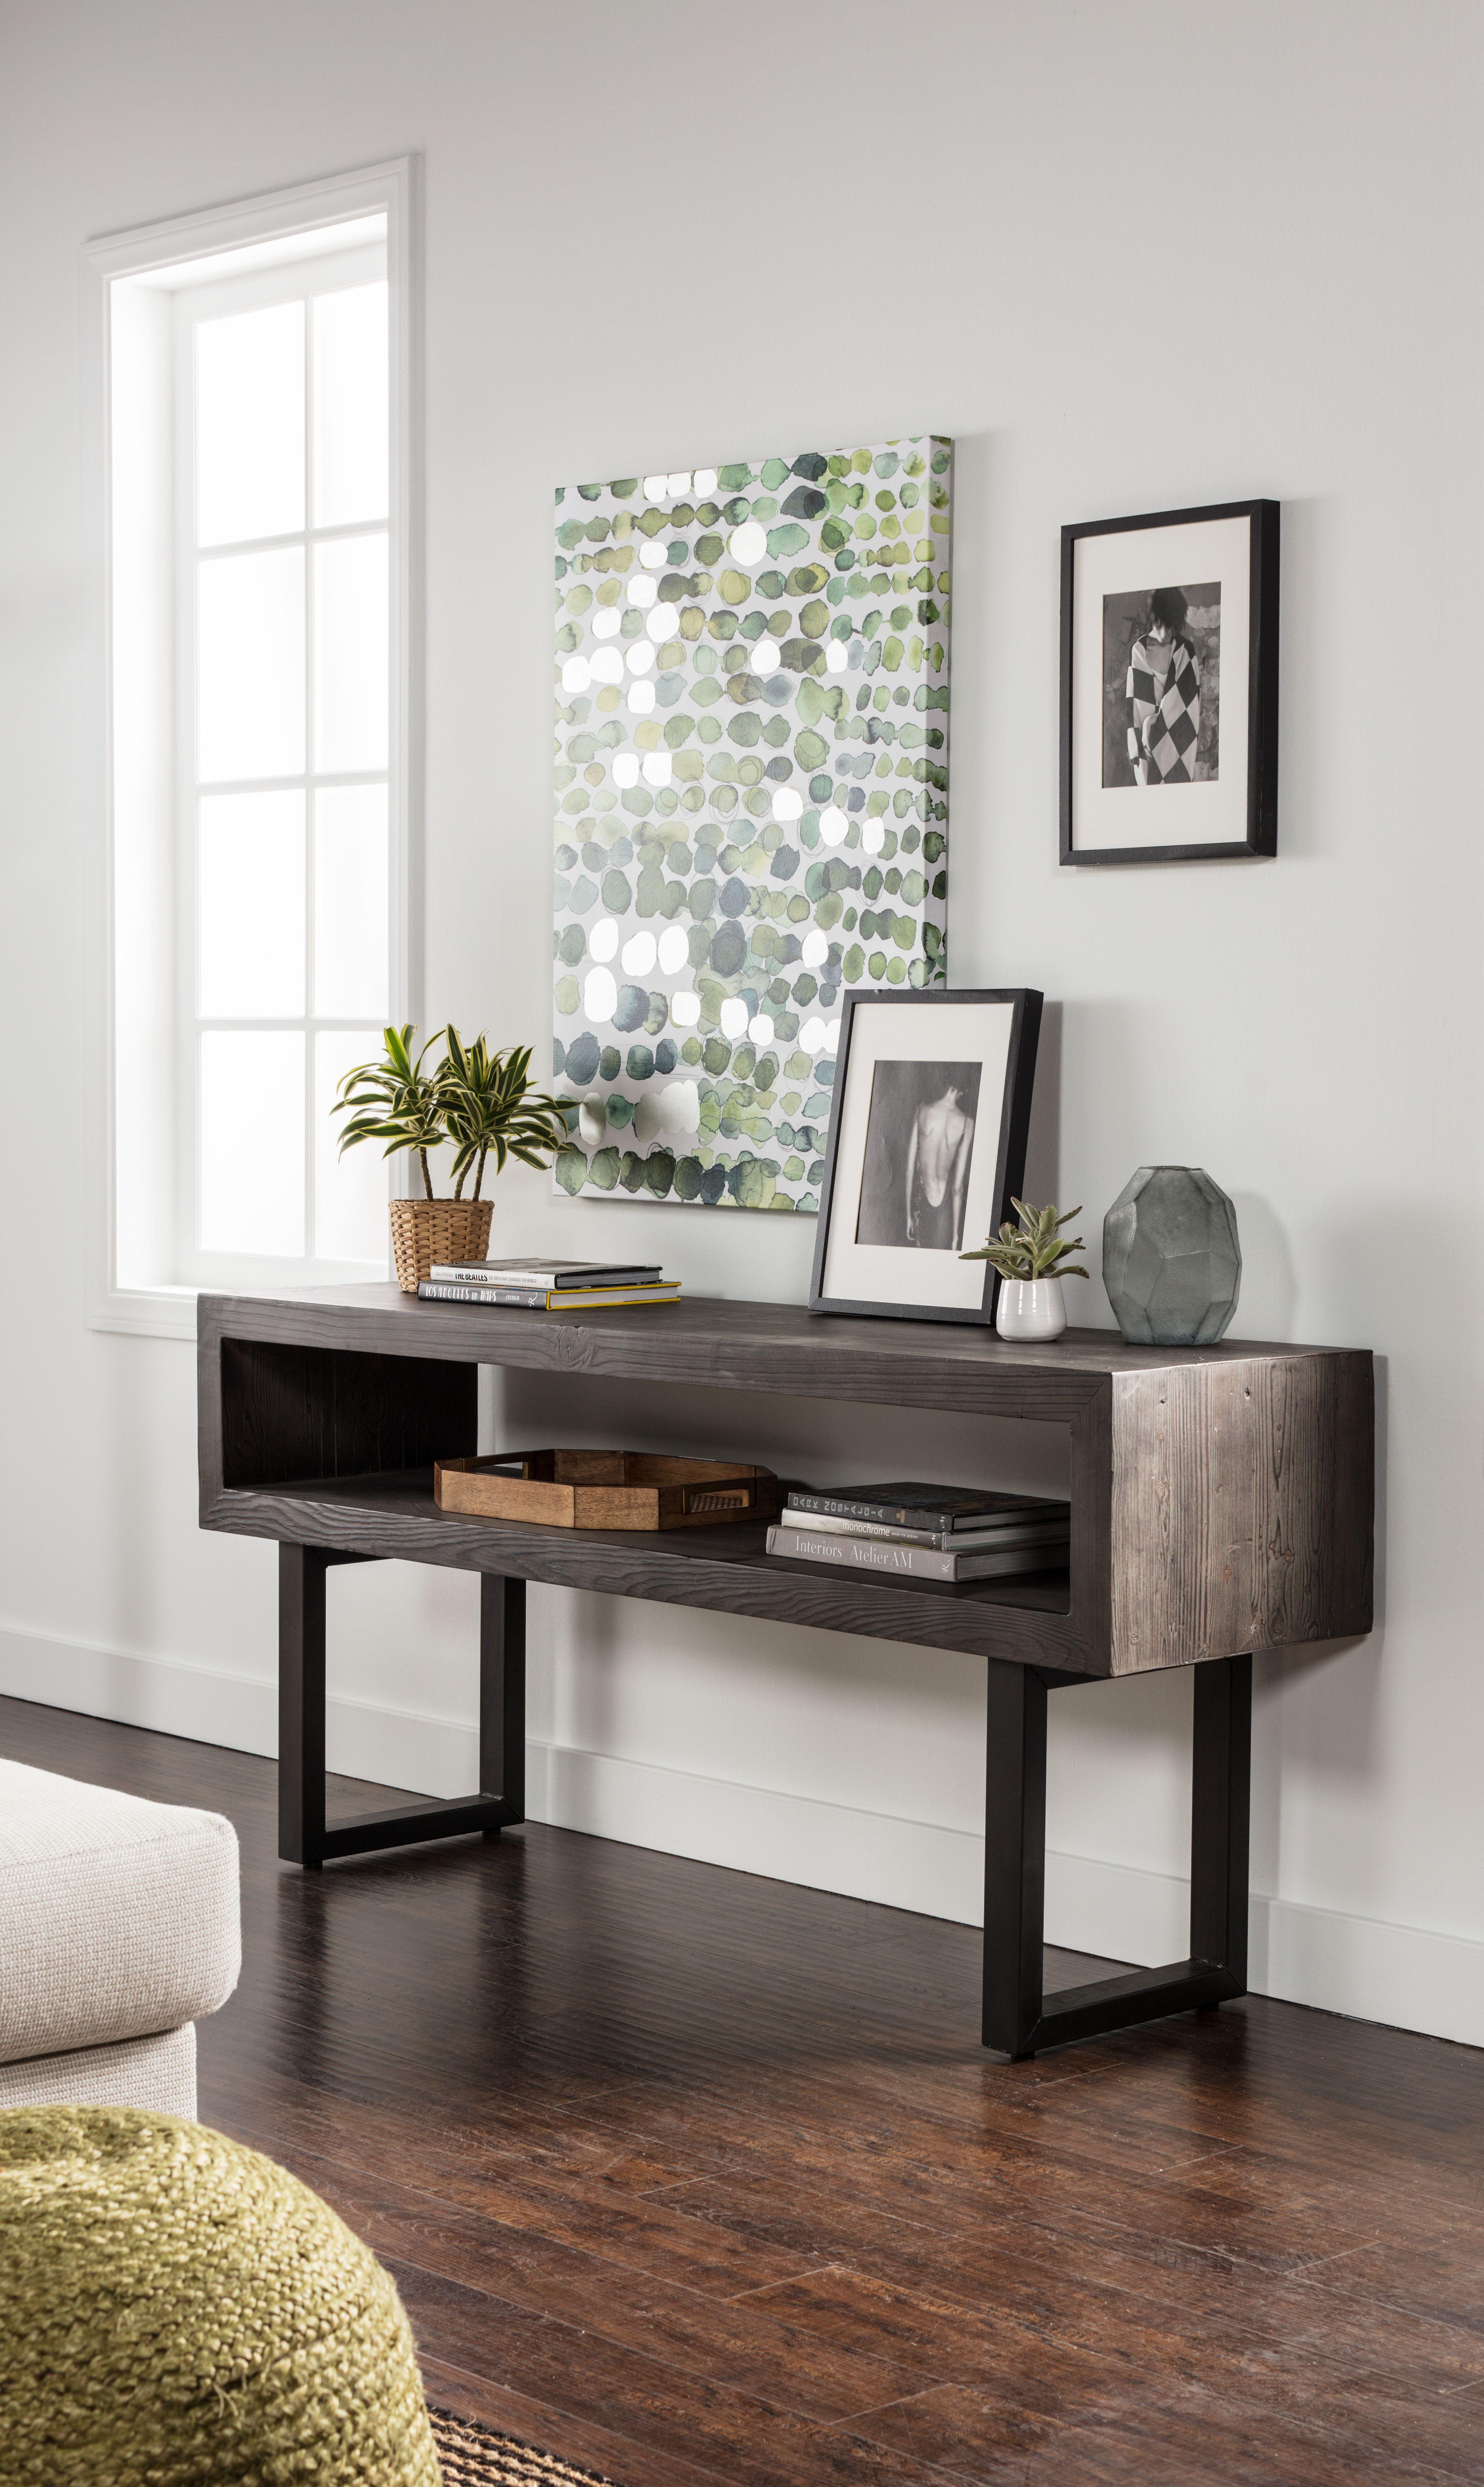 Verona Console Sofa Table Sleek Modern Design With Open Storage